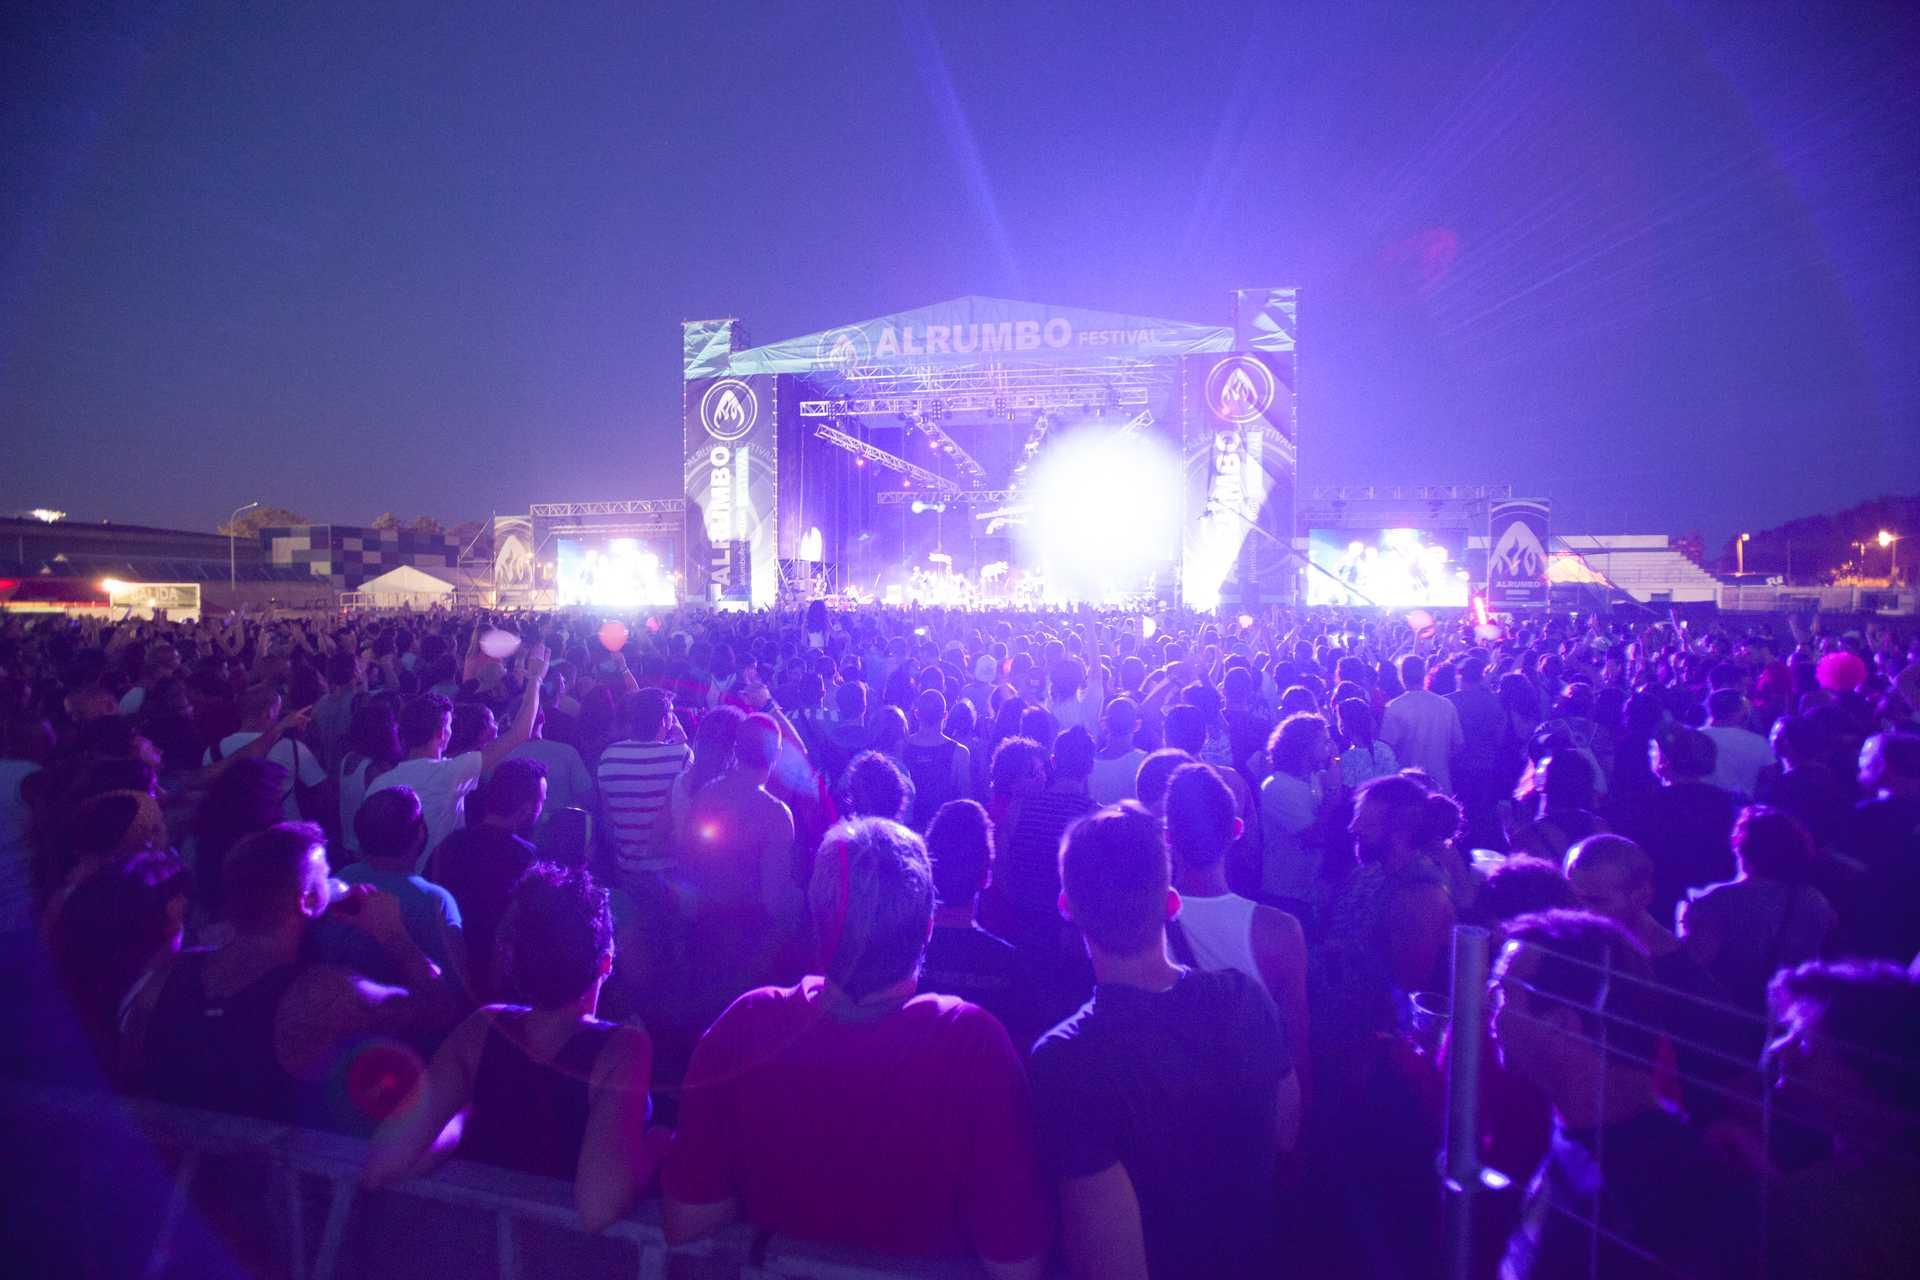 Festival Al Rumbo